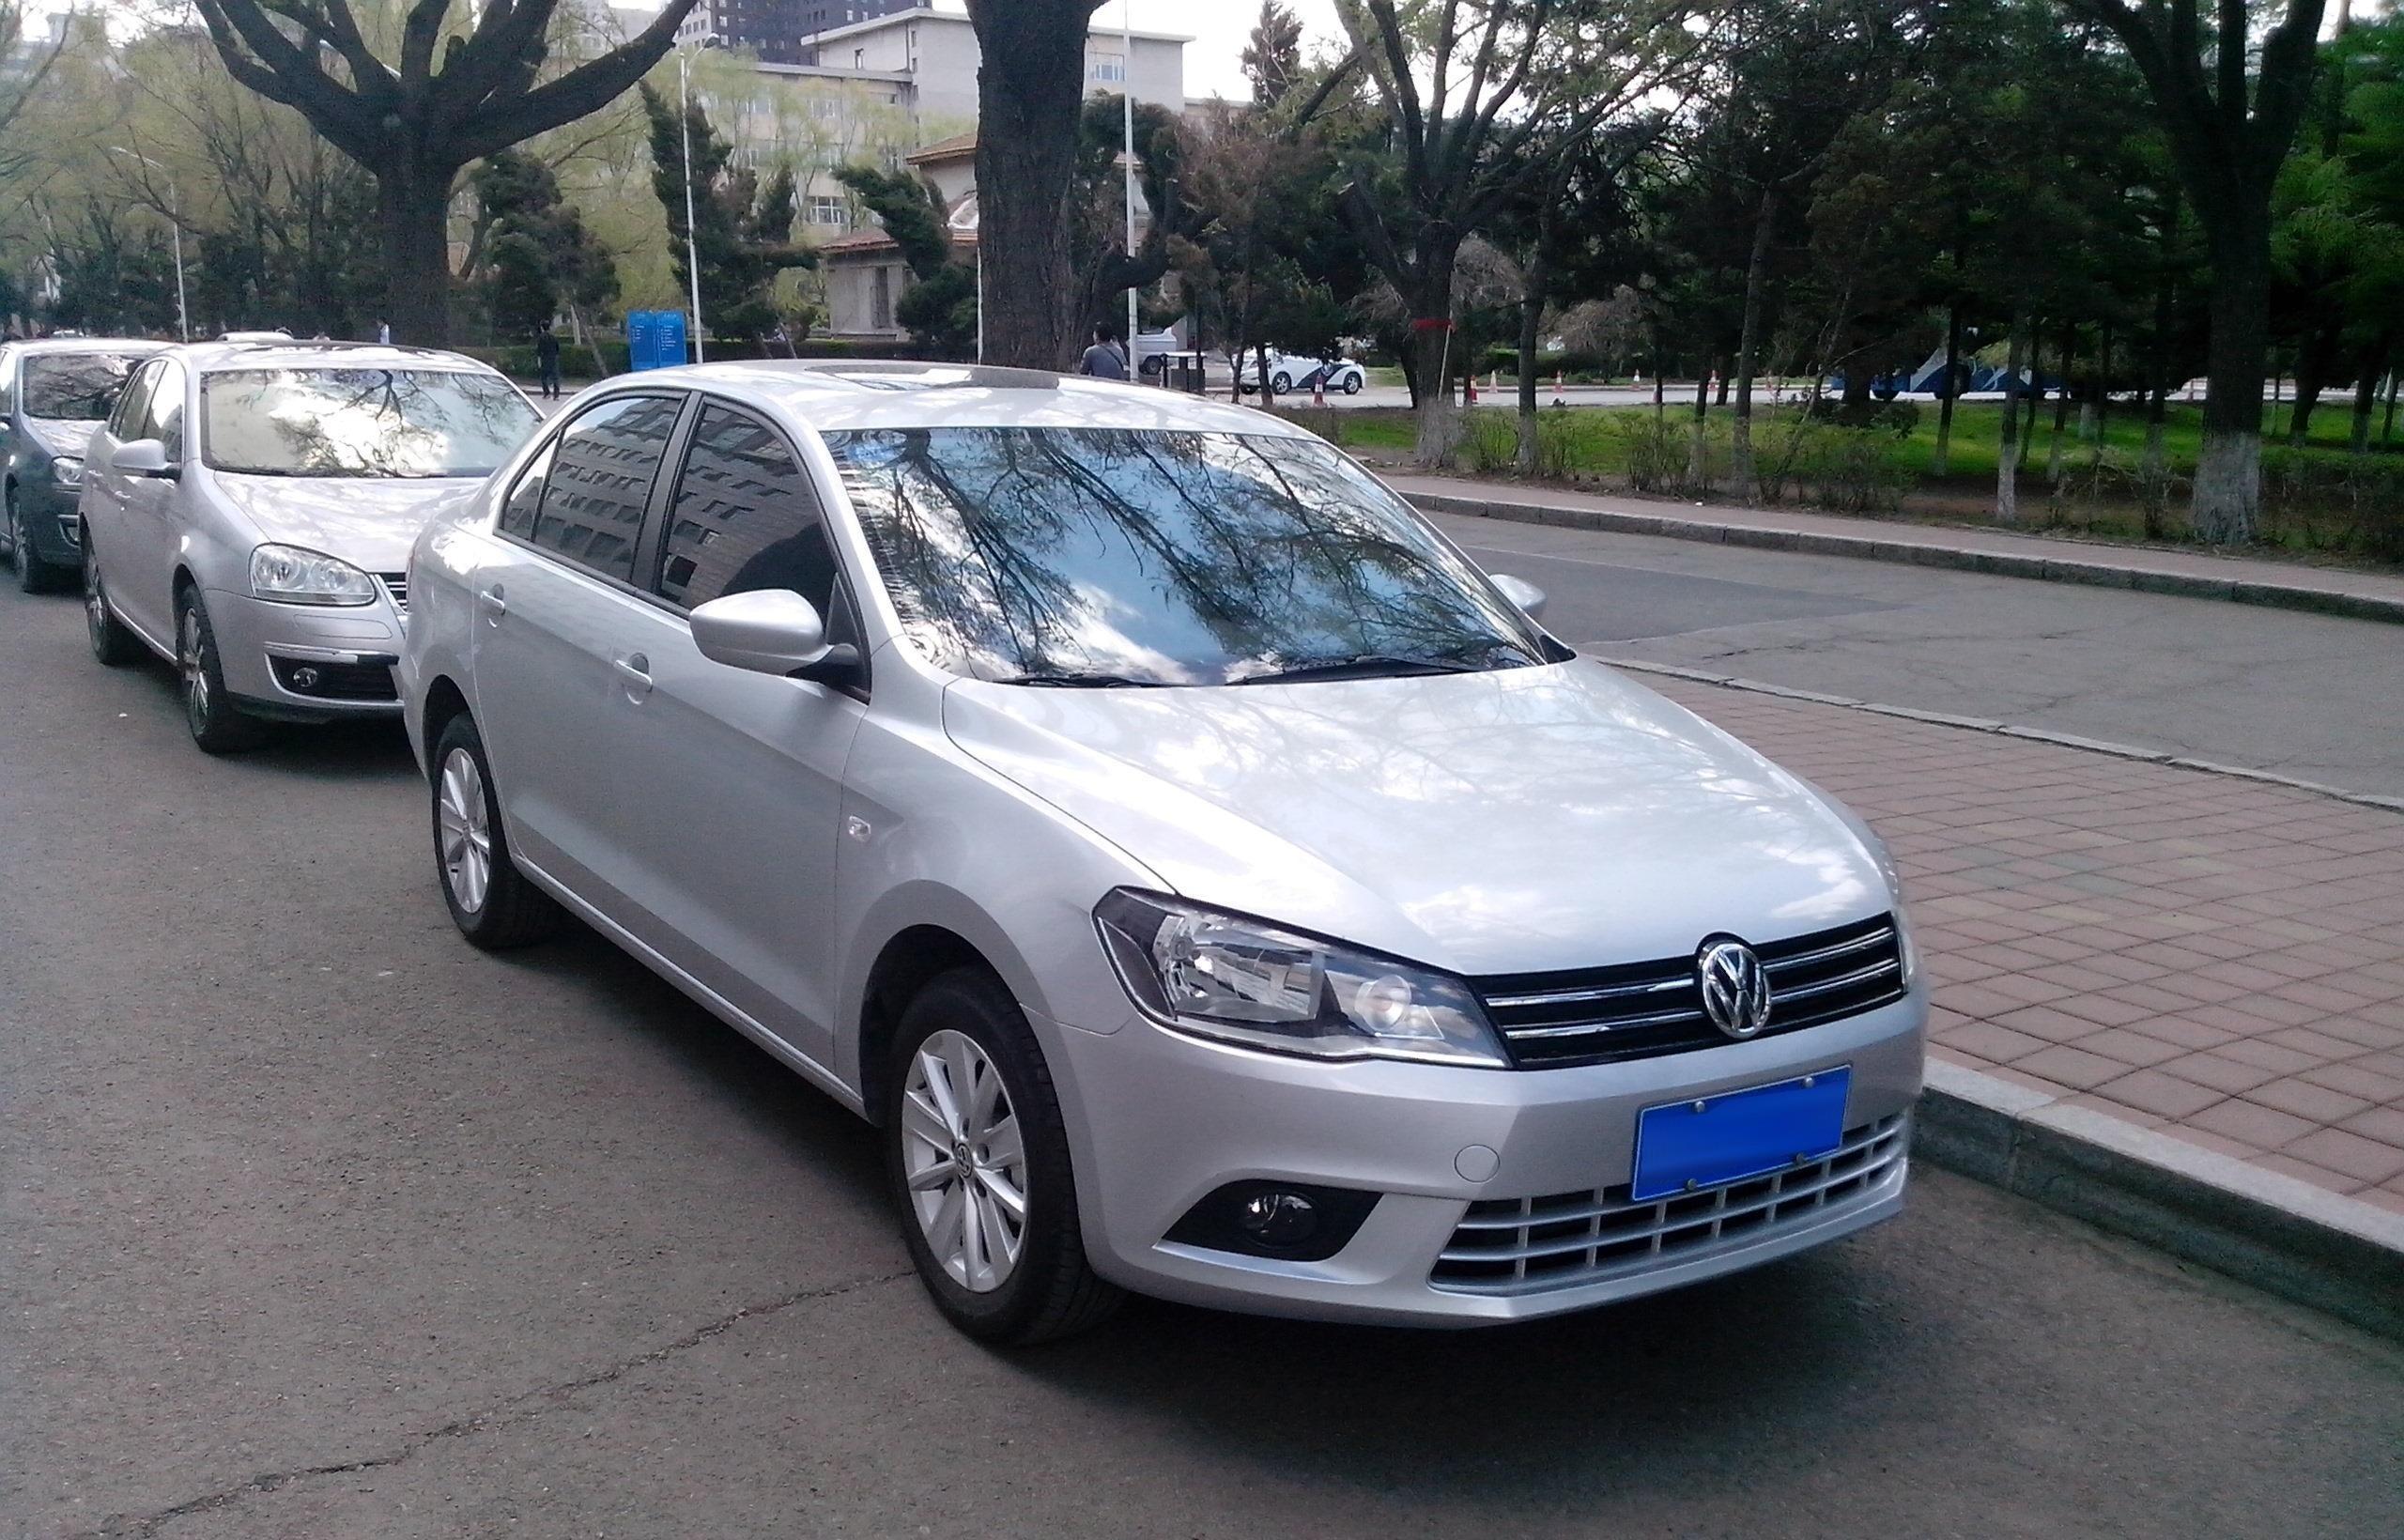 File:Volkswagen Jetta 2013 (Chinese market), front quarter.jpg - Wikimedia Commons